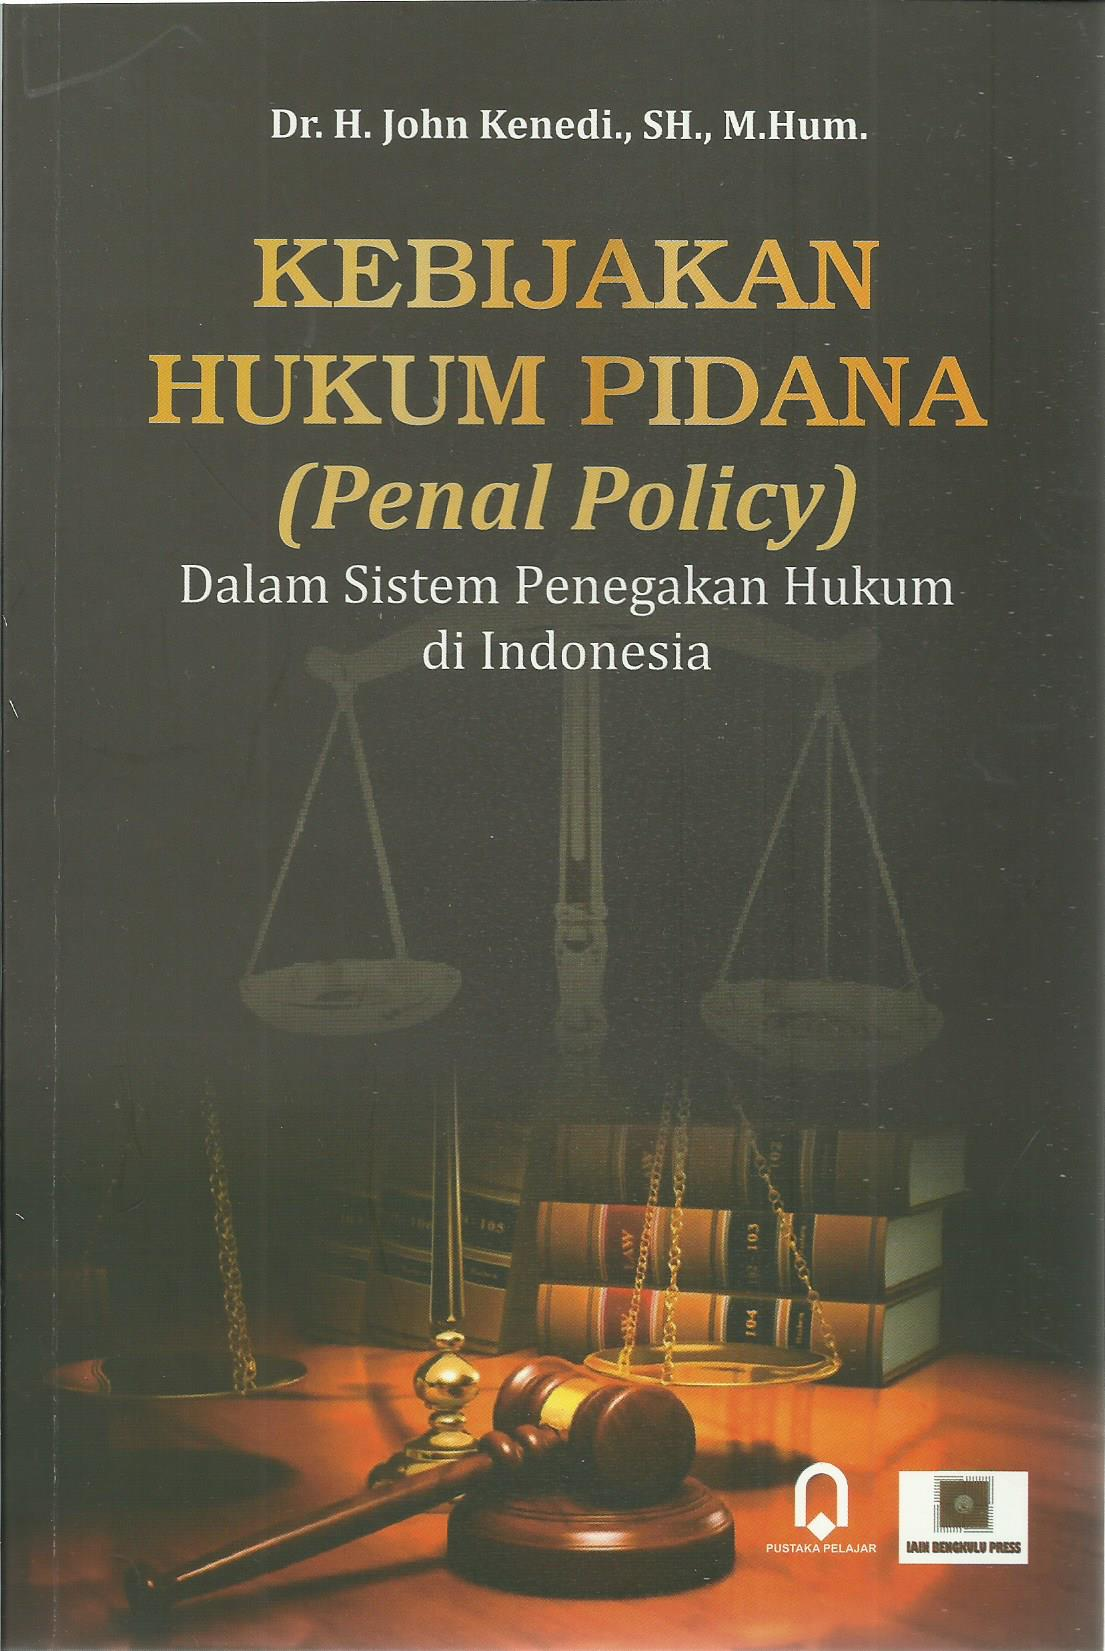 Kebijakan Hukum Pidana